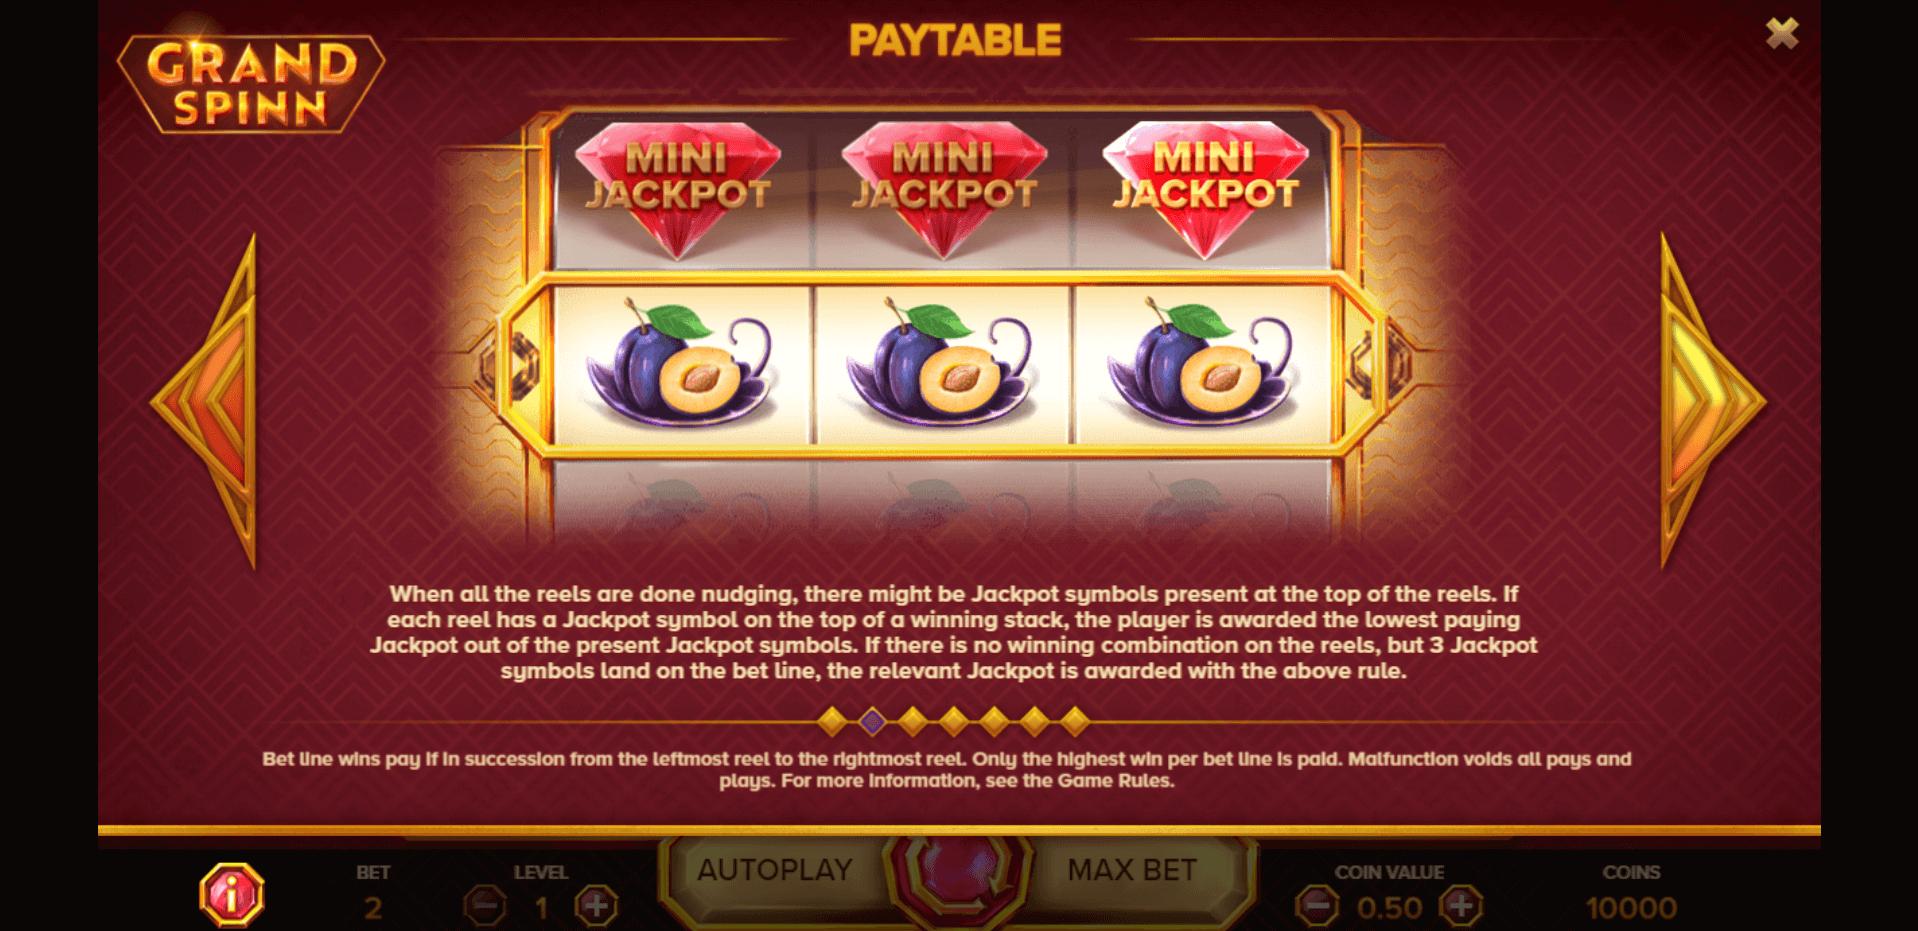 Grand Spinn Slot Machine